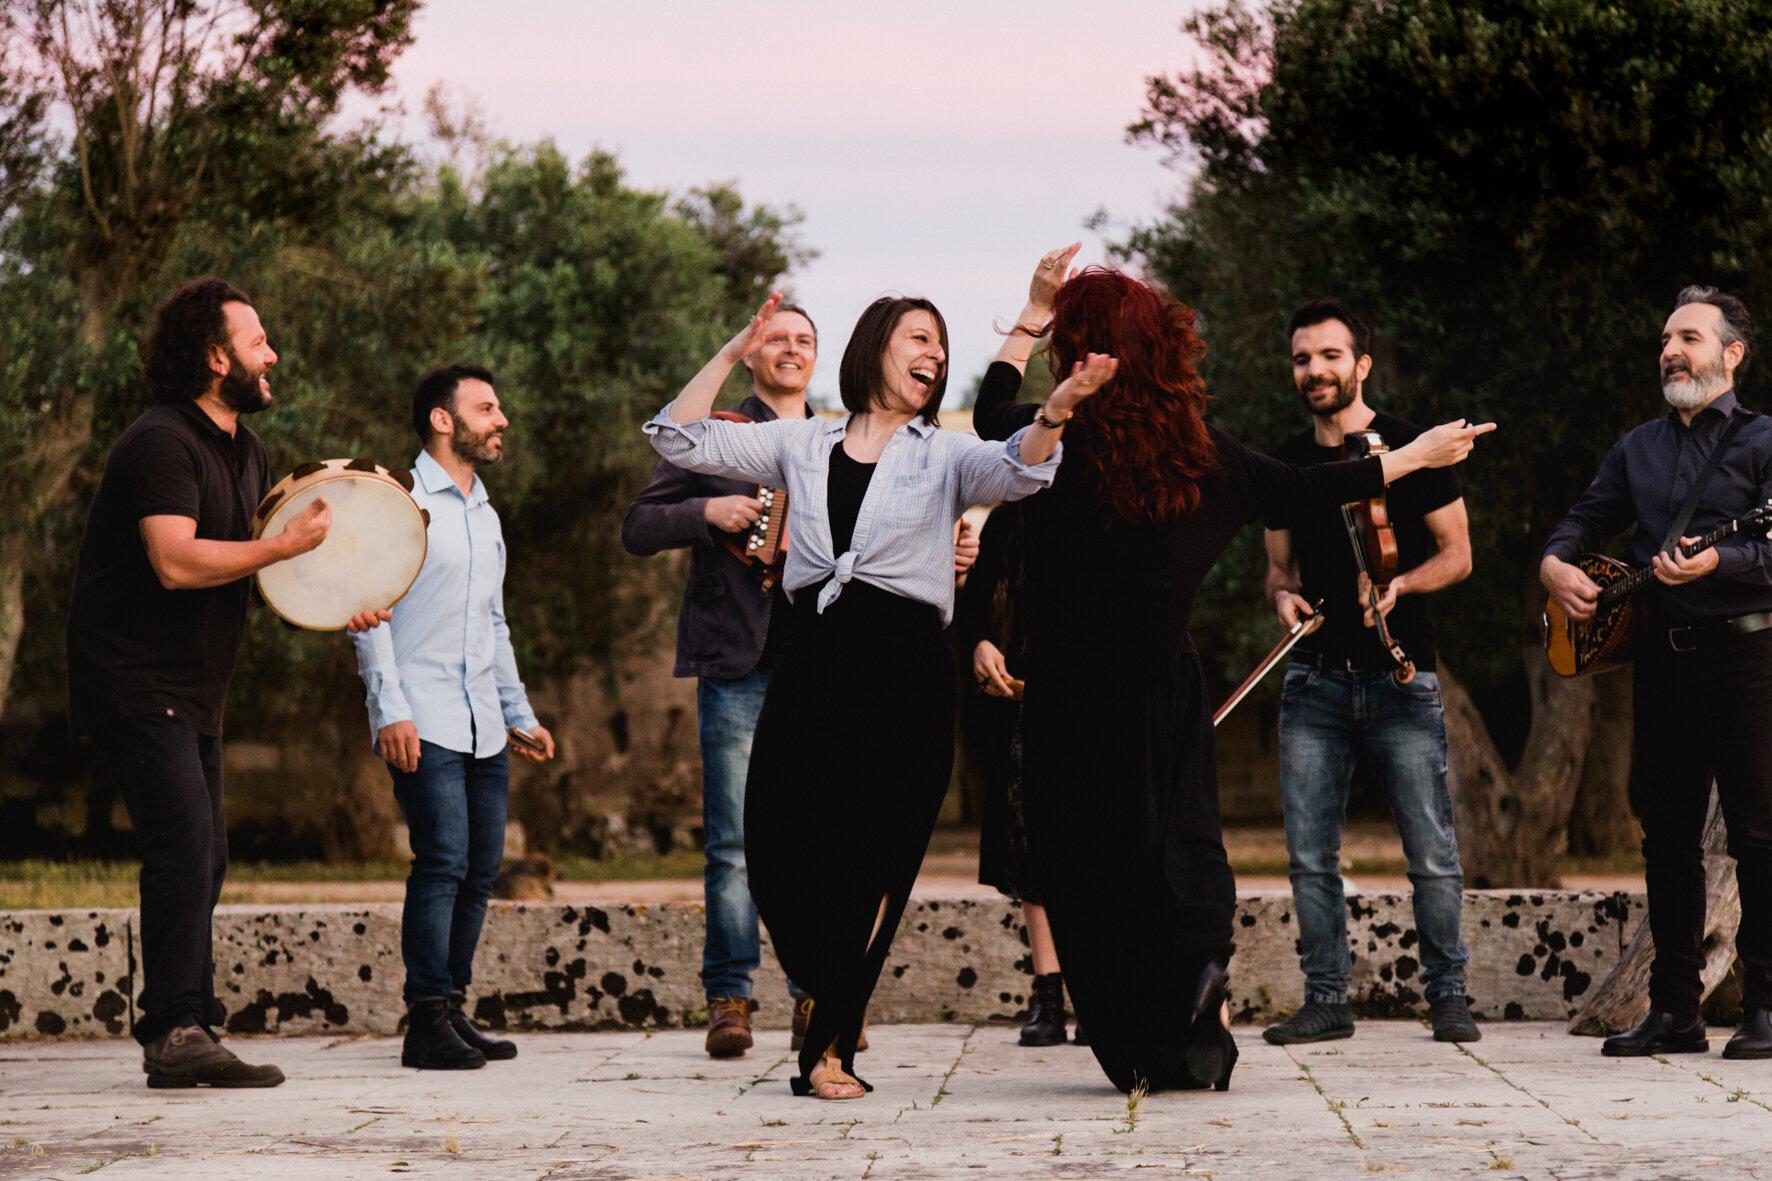 301 Puglia - Canzoniere Grecanico Salentino and Mickela Mallozzi_photo by Shoot My Travel.jpg